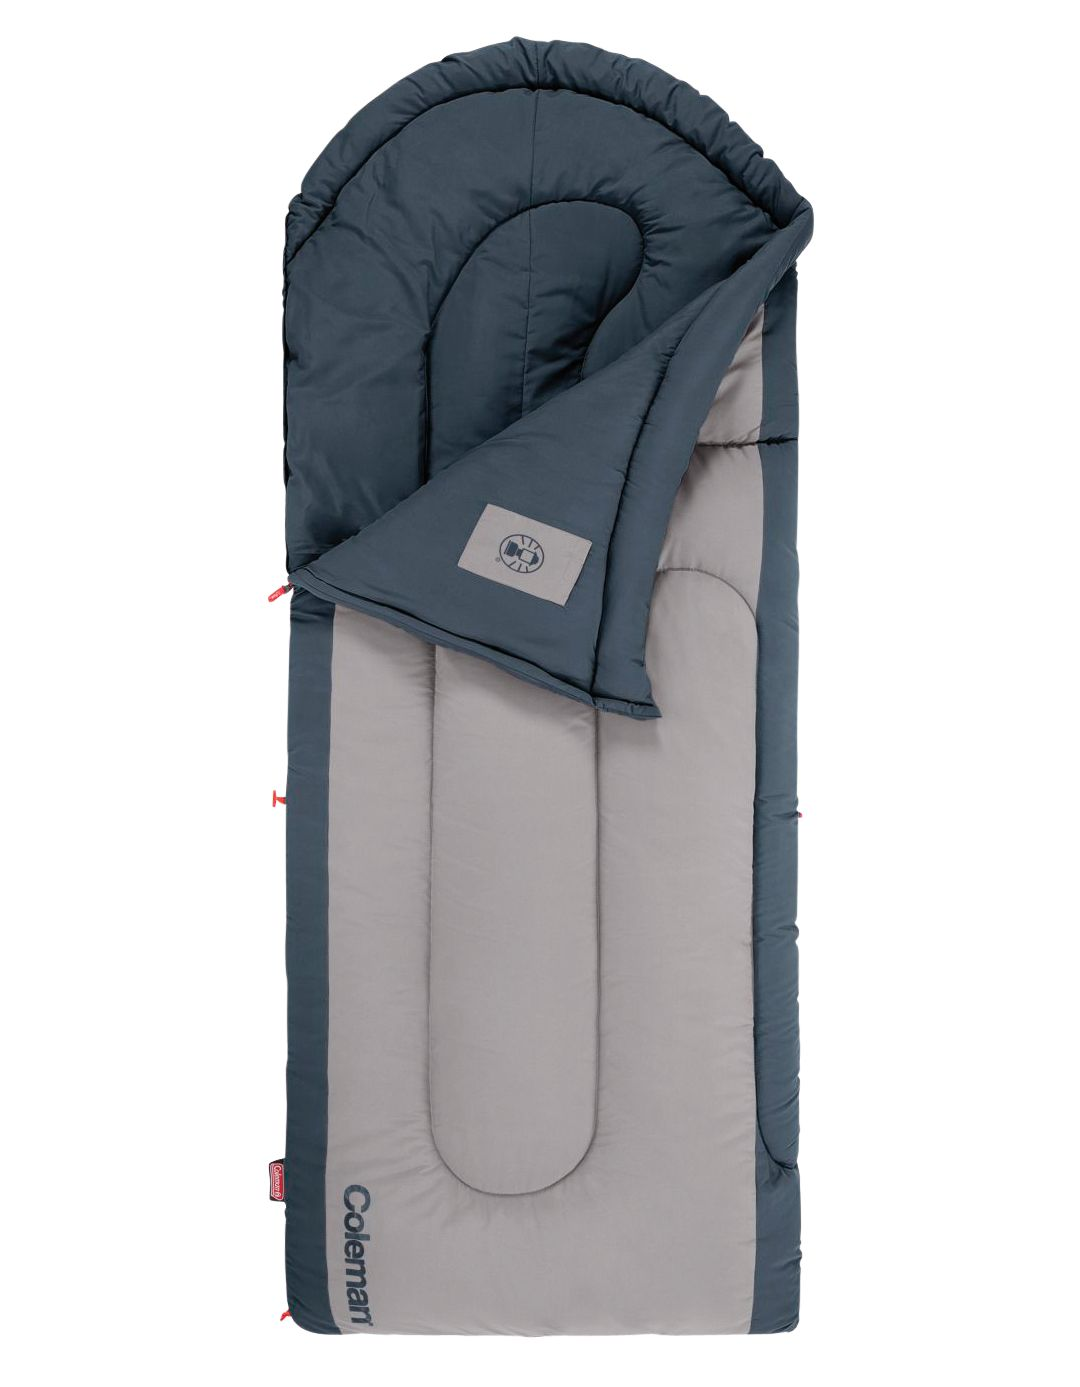 Coleman River Gorge 10° Big & Tall Sleeping Bag